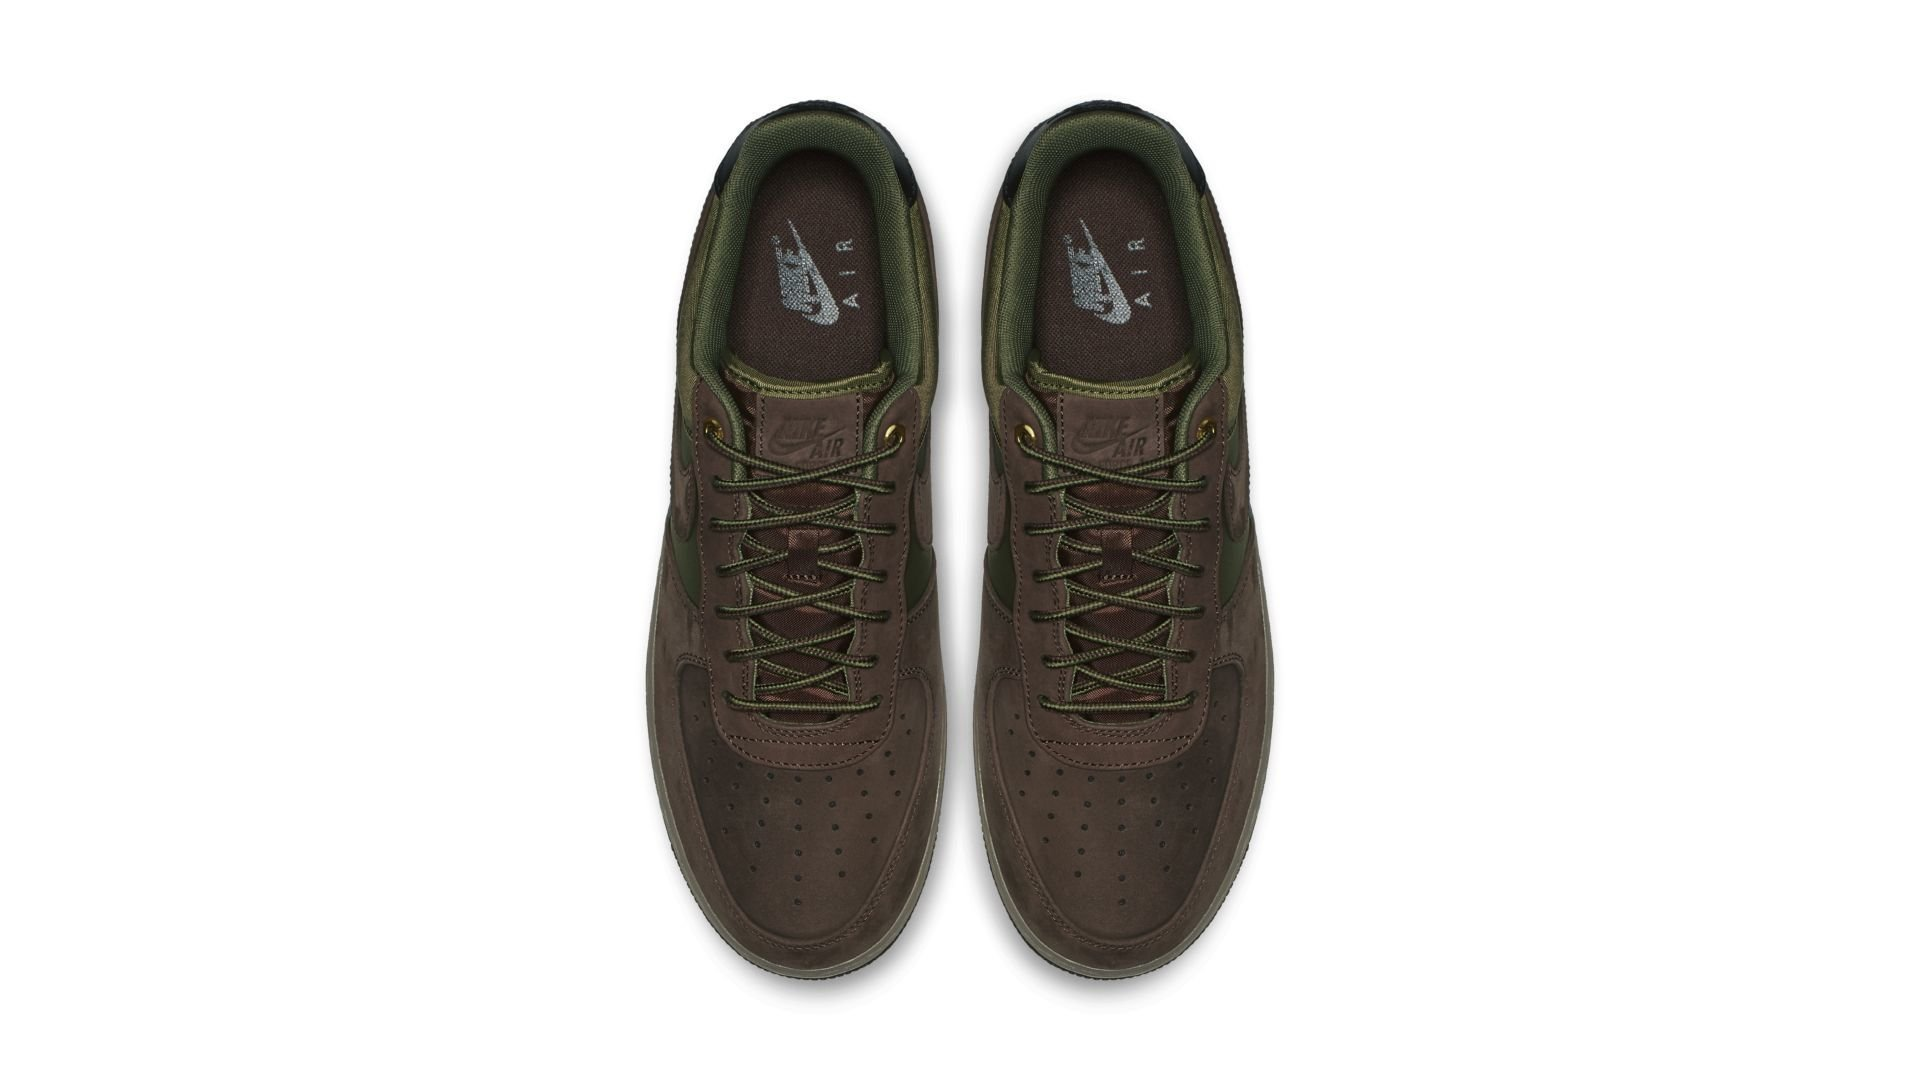 Nike Air Force 1 '07 Premier 'Baroque Brown' (AJ7408-200)